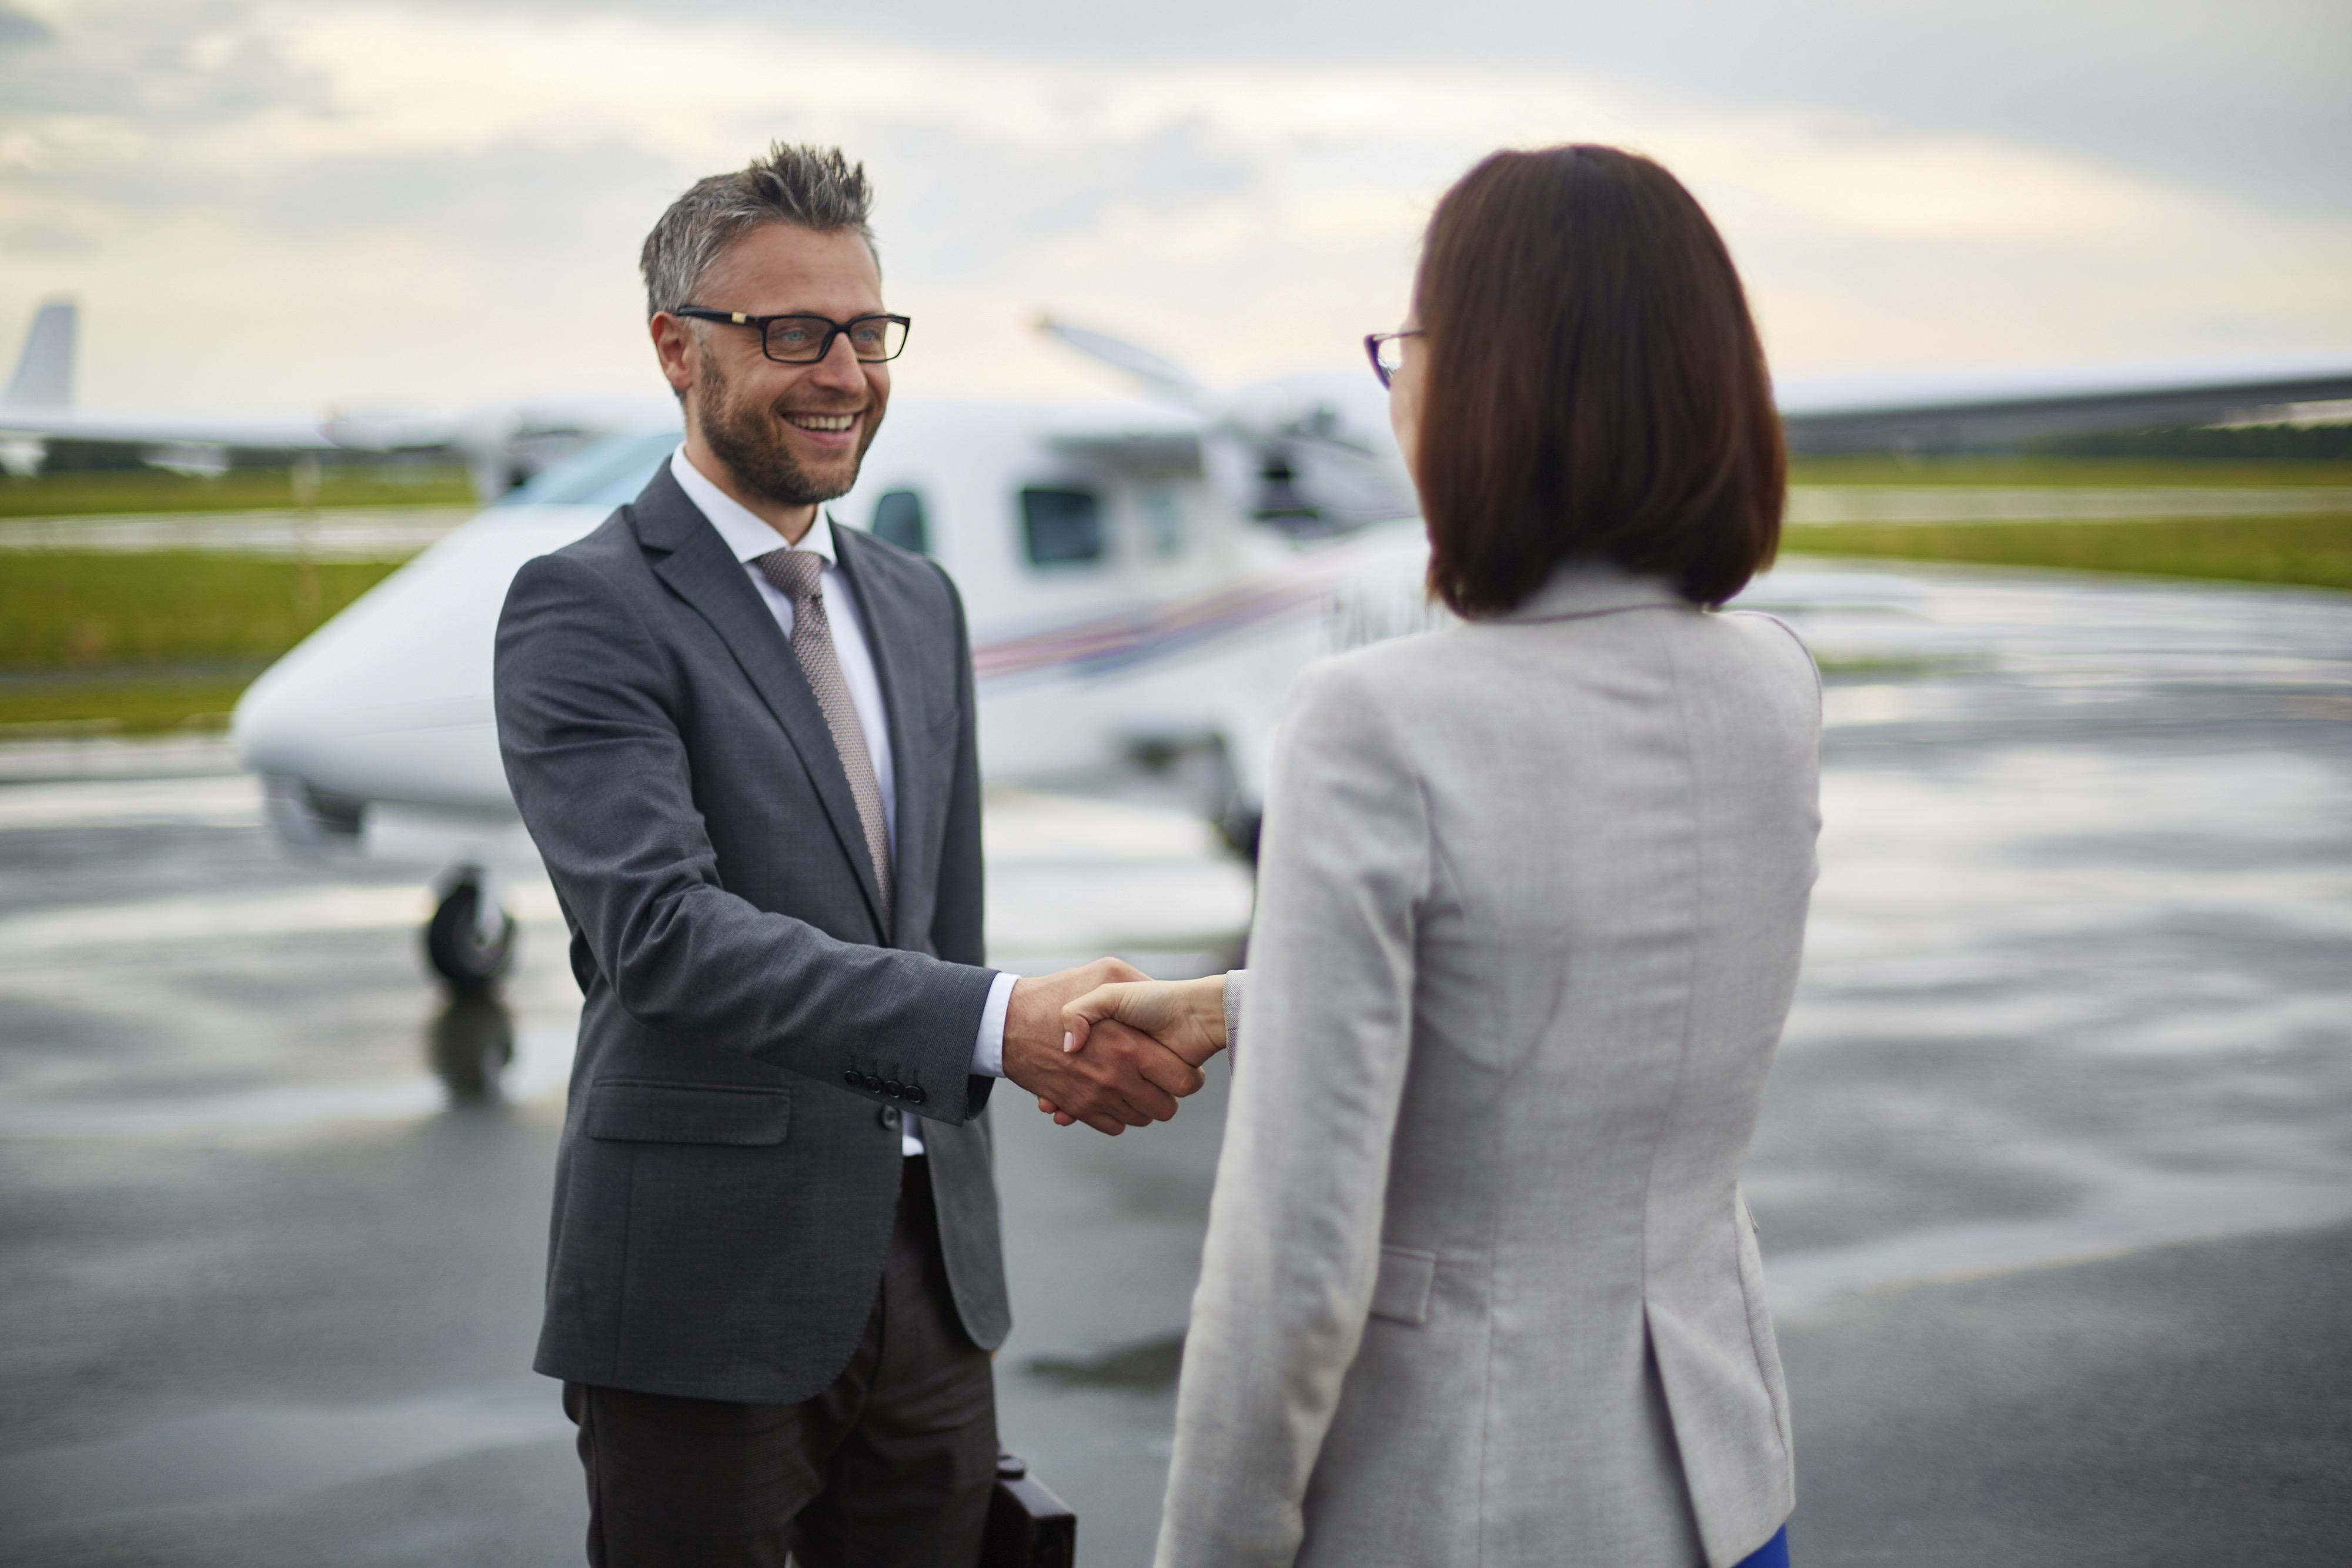 Happy businessman handshaking with his partner in airport